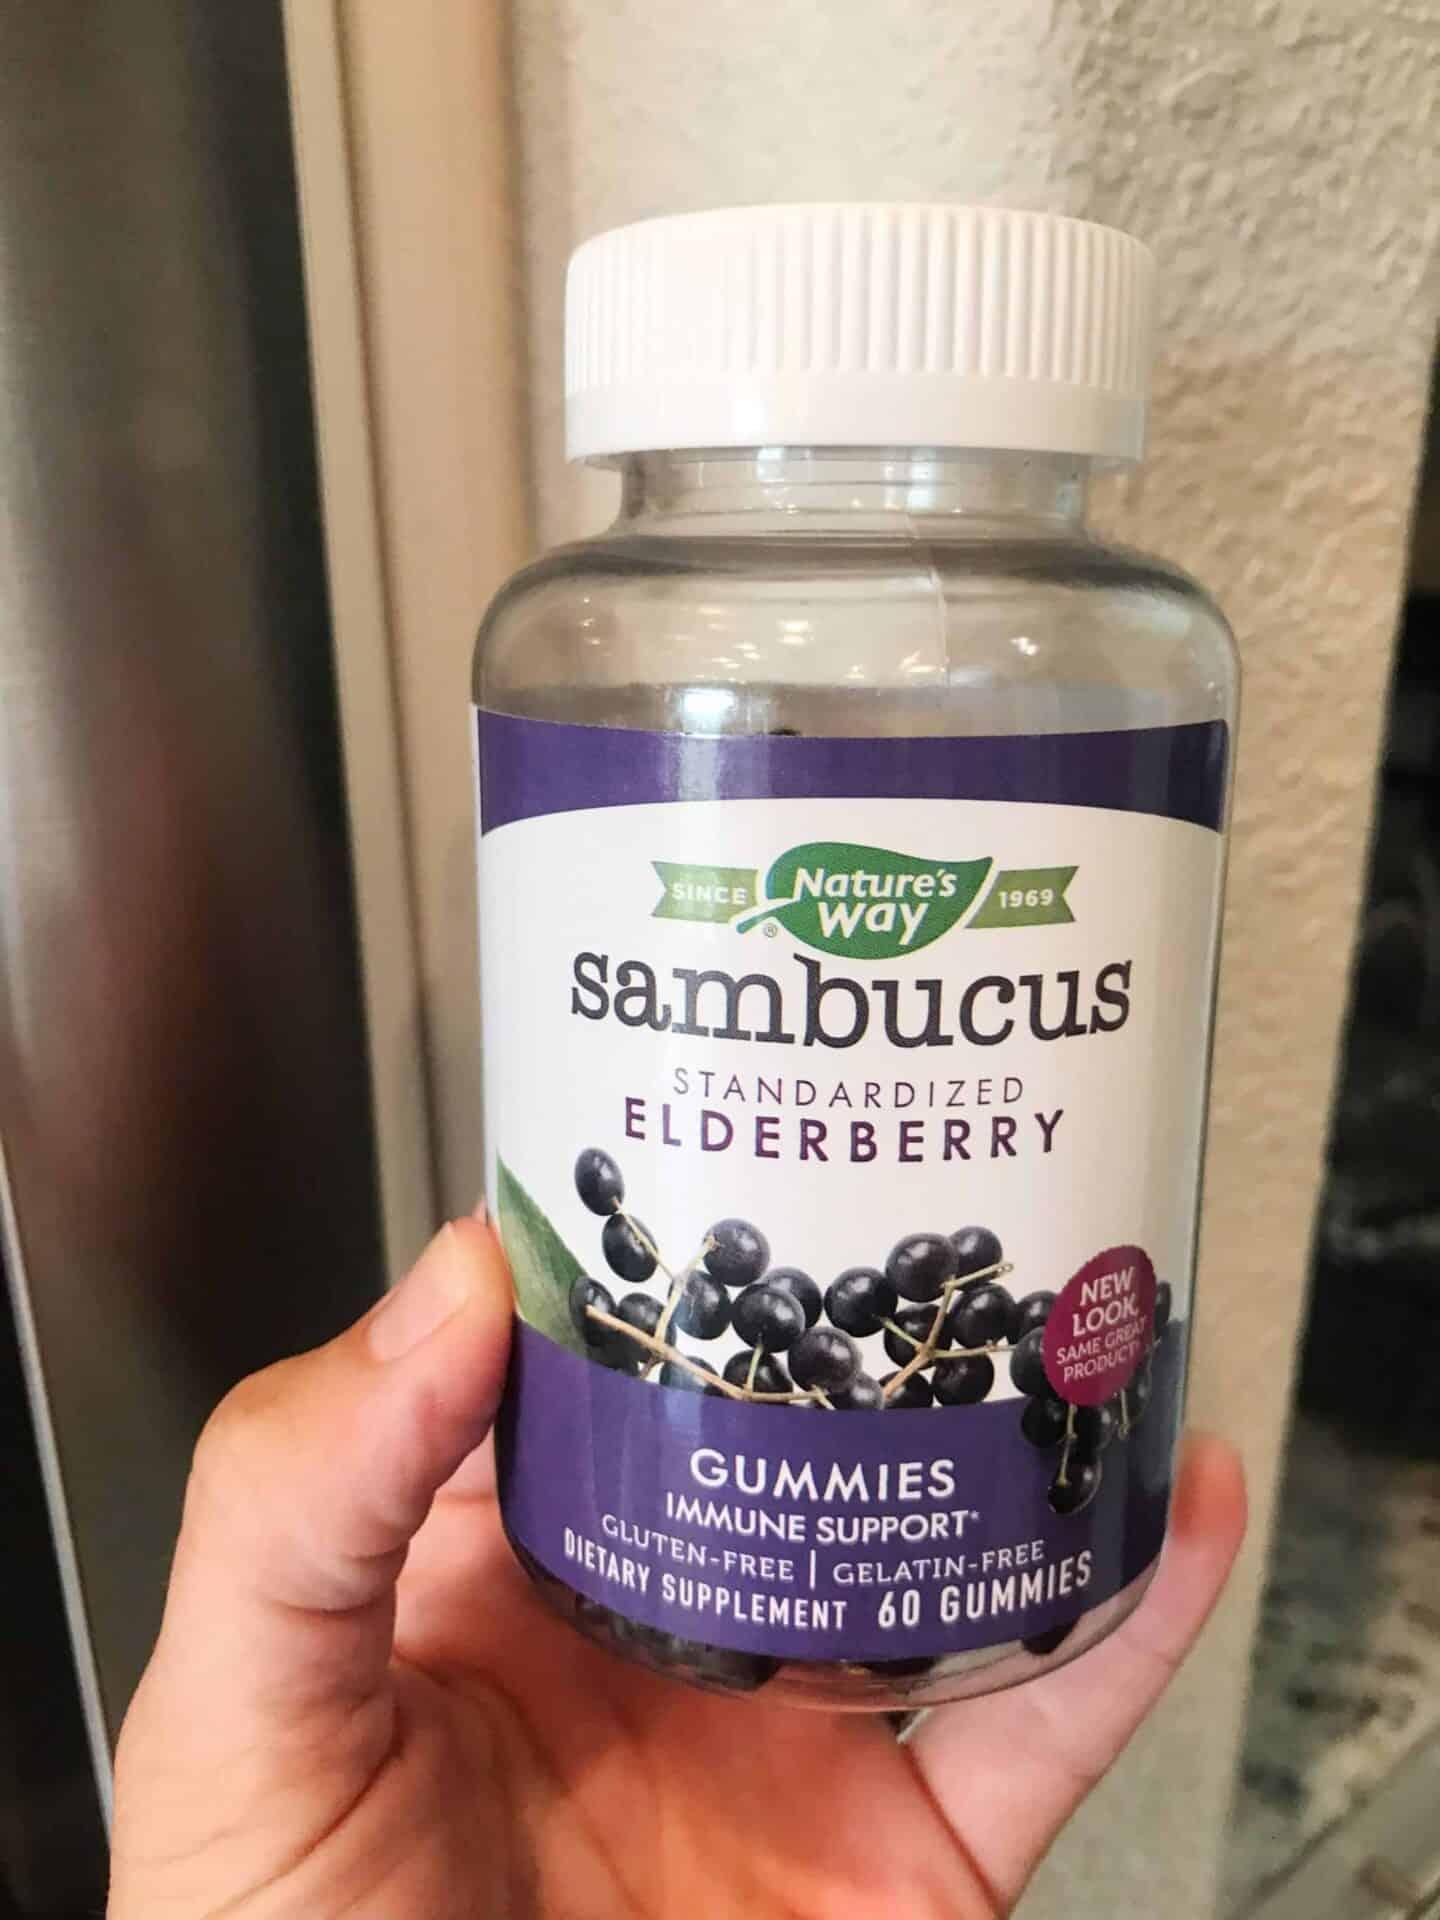 Elderberry Gummies for Immune Support Back to School